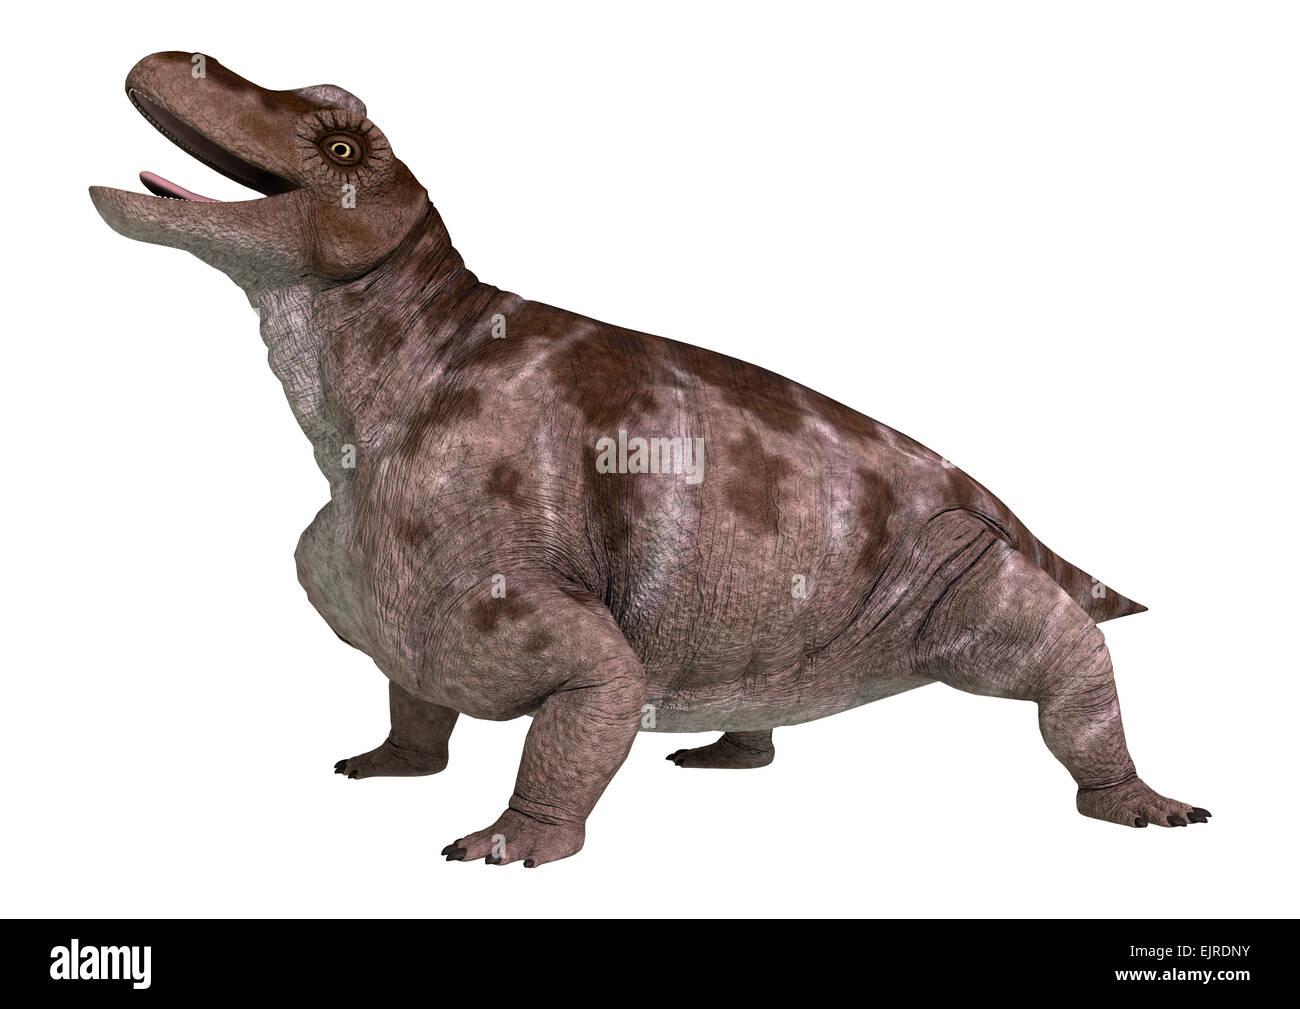 3D digital render of a dinosaur keratocephalus isolated on white background - Stock Image